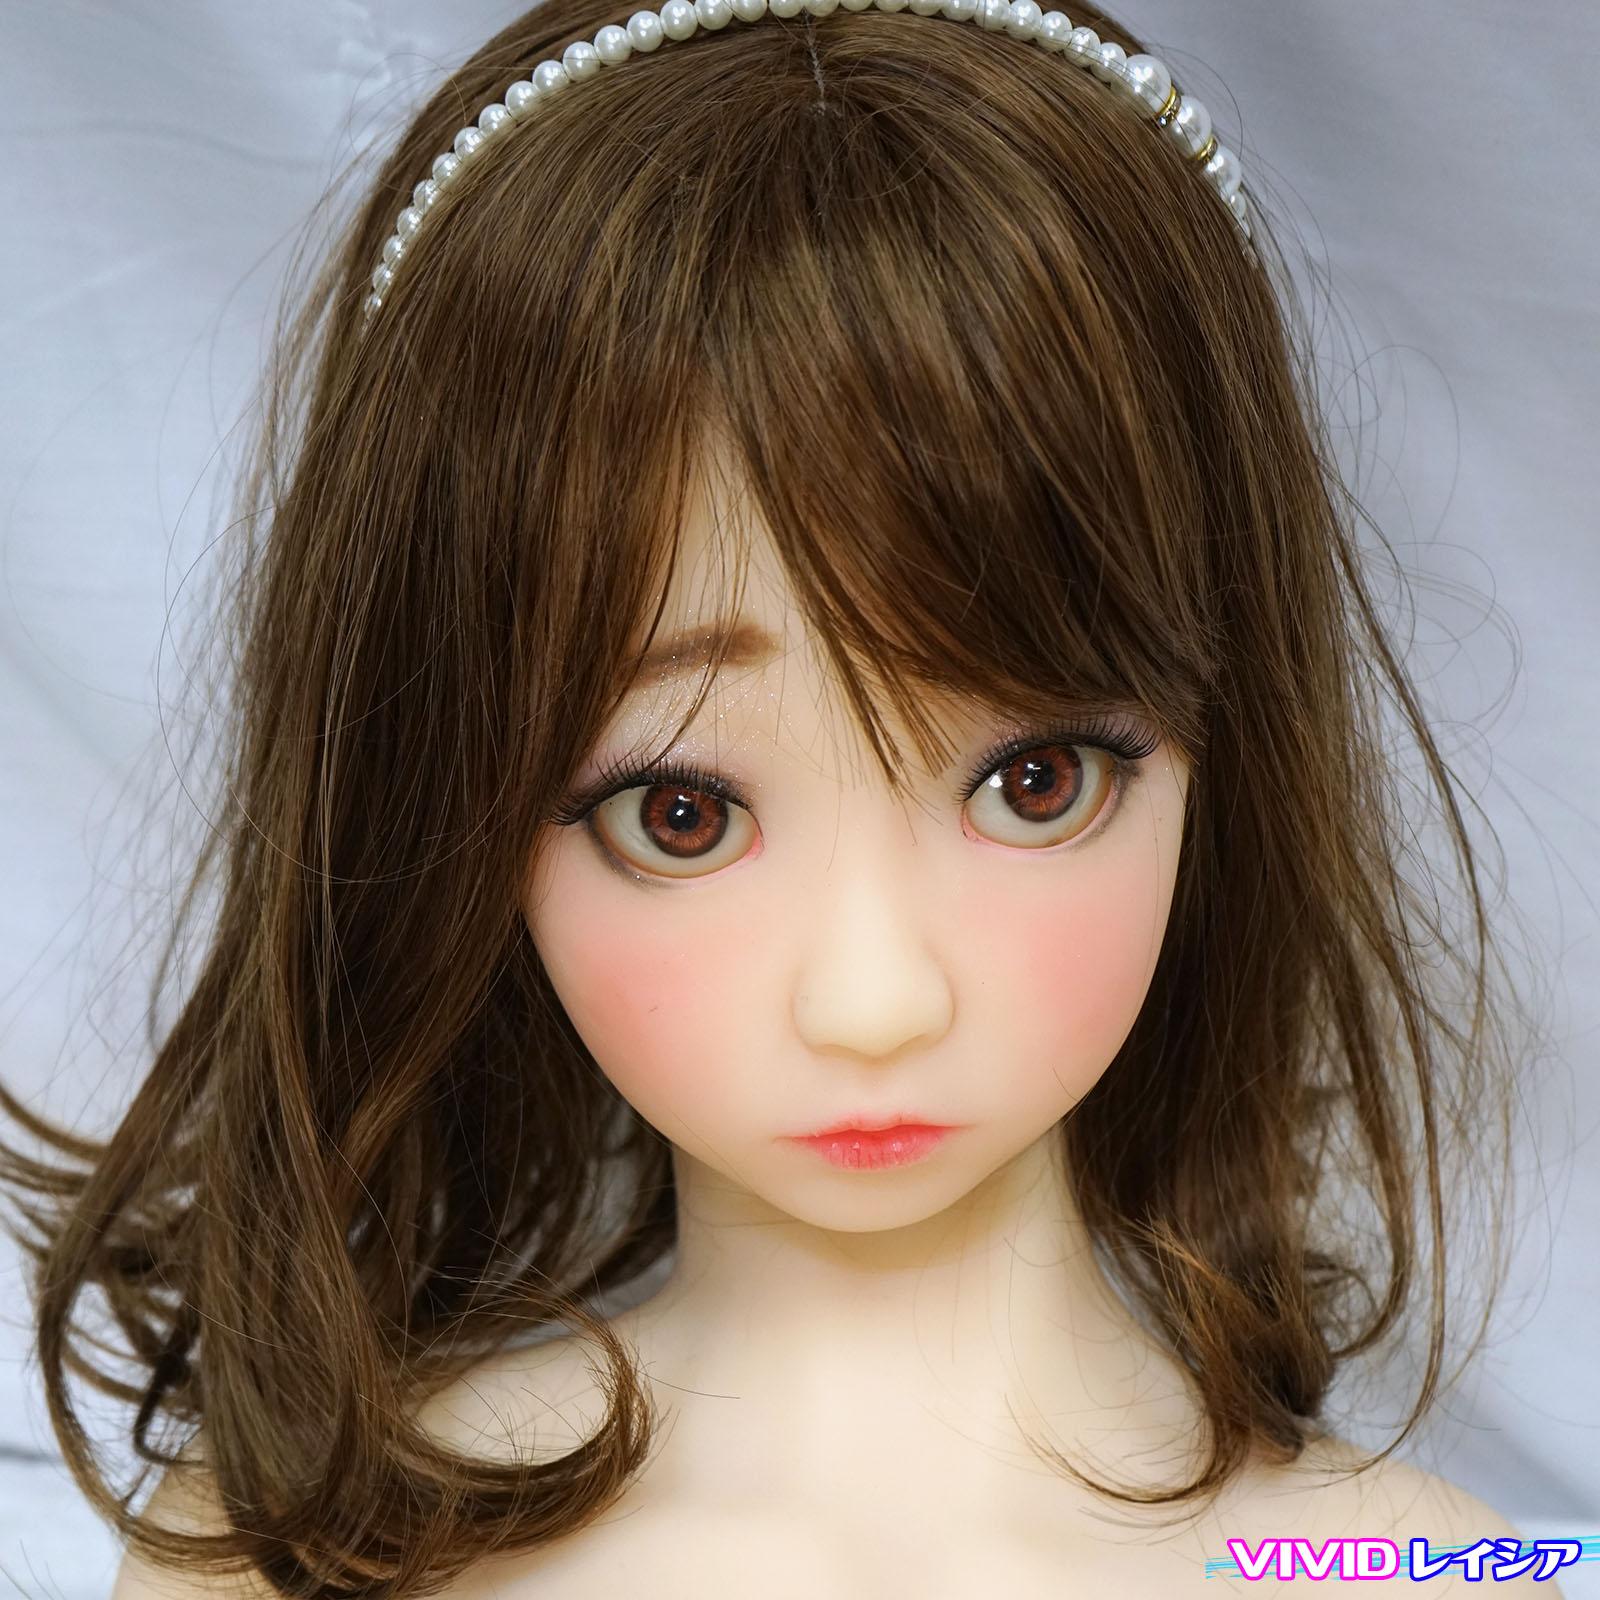 DollHouse168sex Doll Honey.com Pussiy